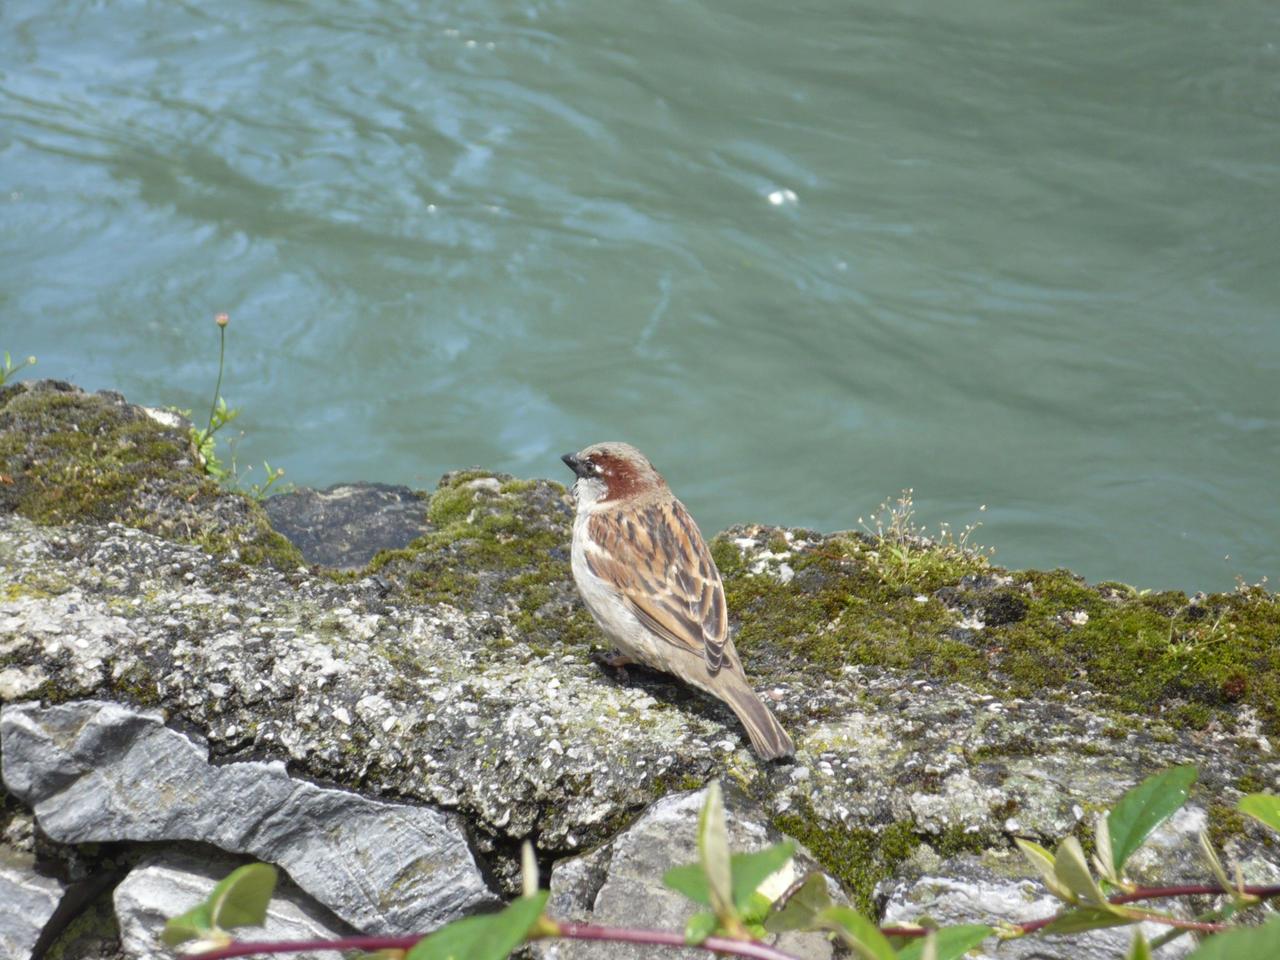 little bird 1 by nicolapin